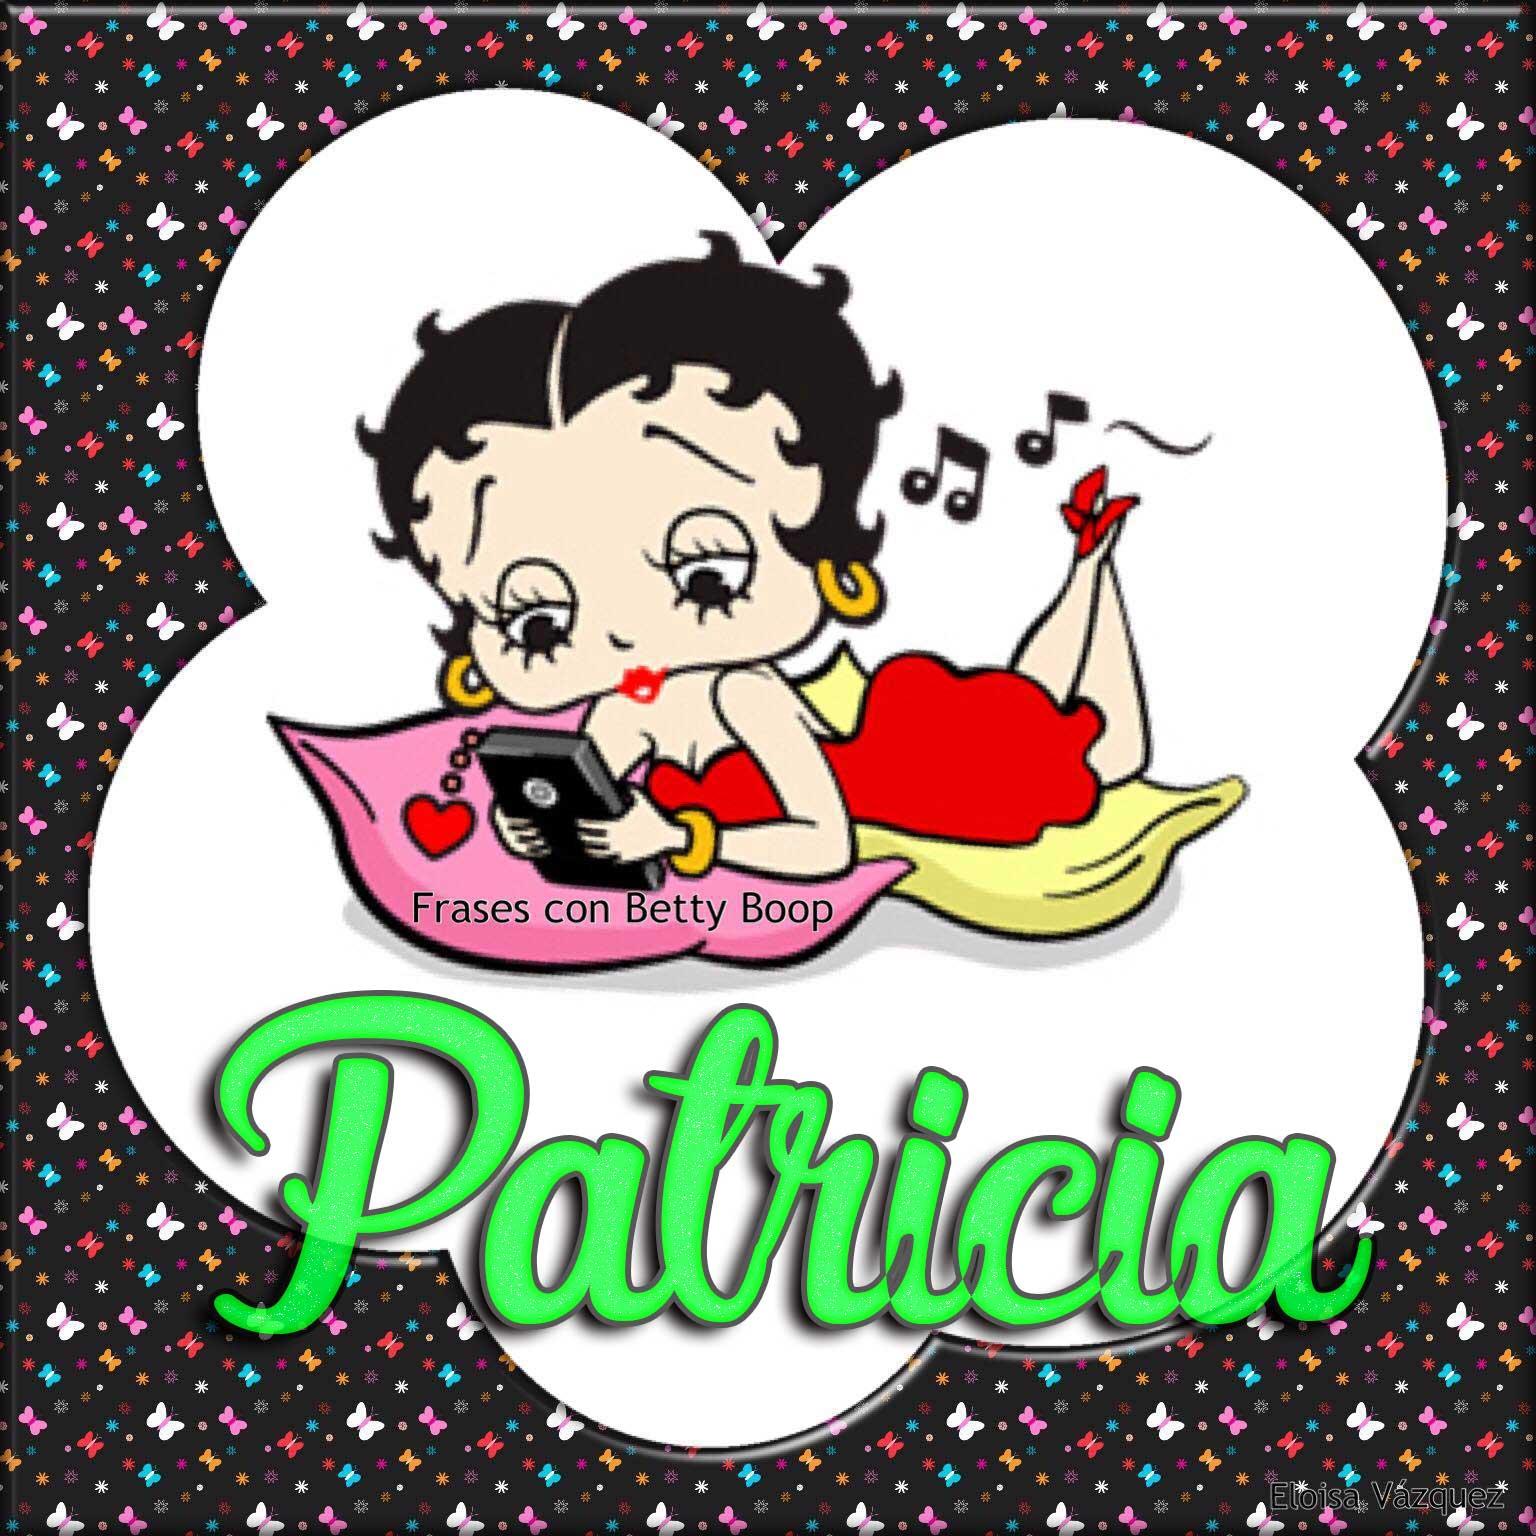 Pin by Eloisa Vazquez on Tarjetitas de Betty Boop con Nombres ...